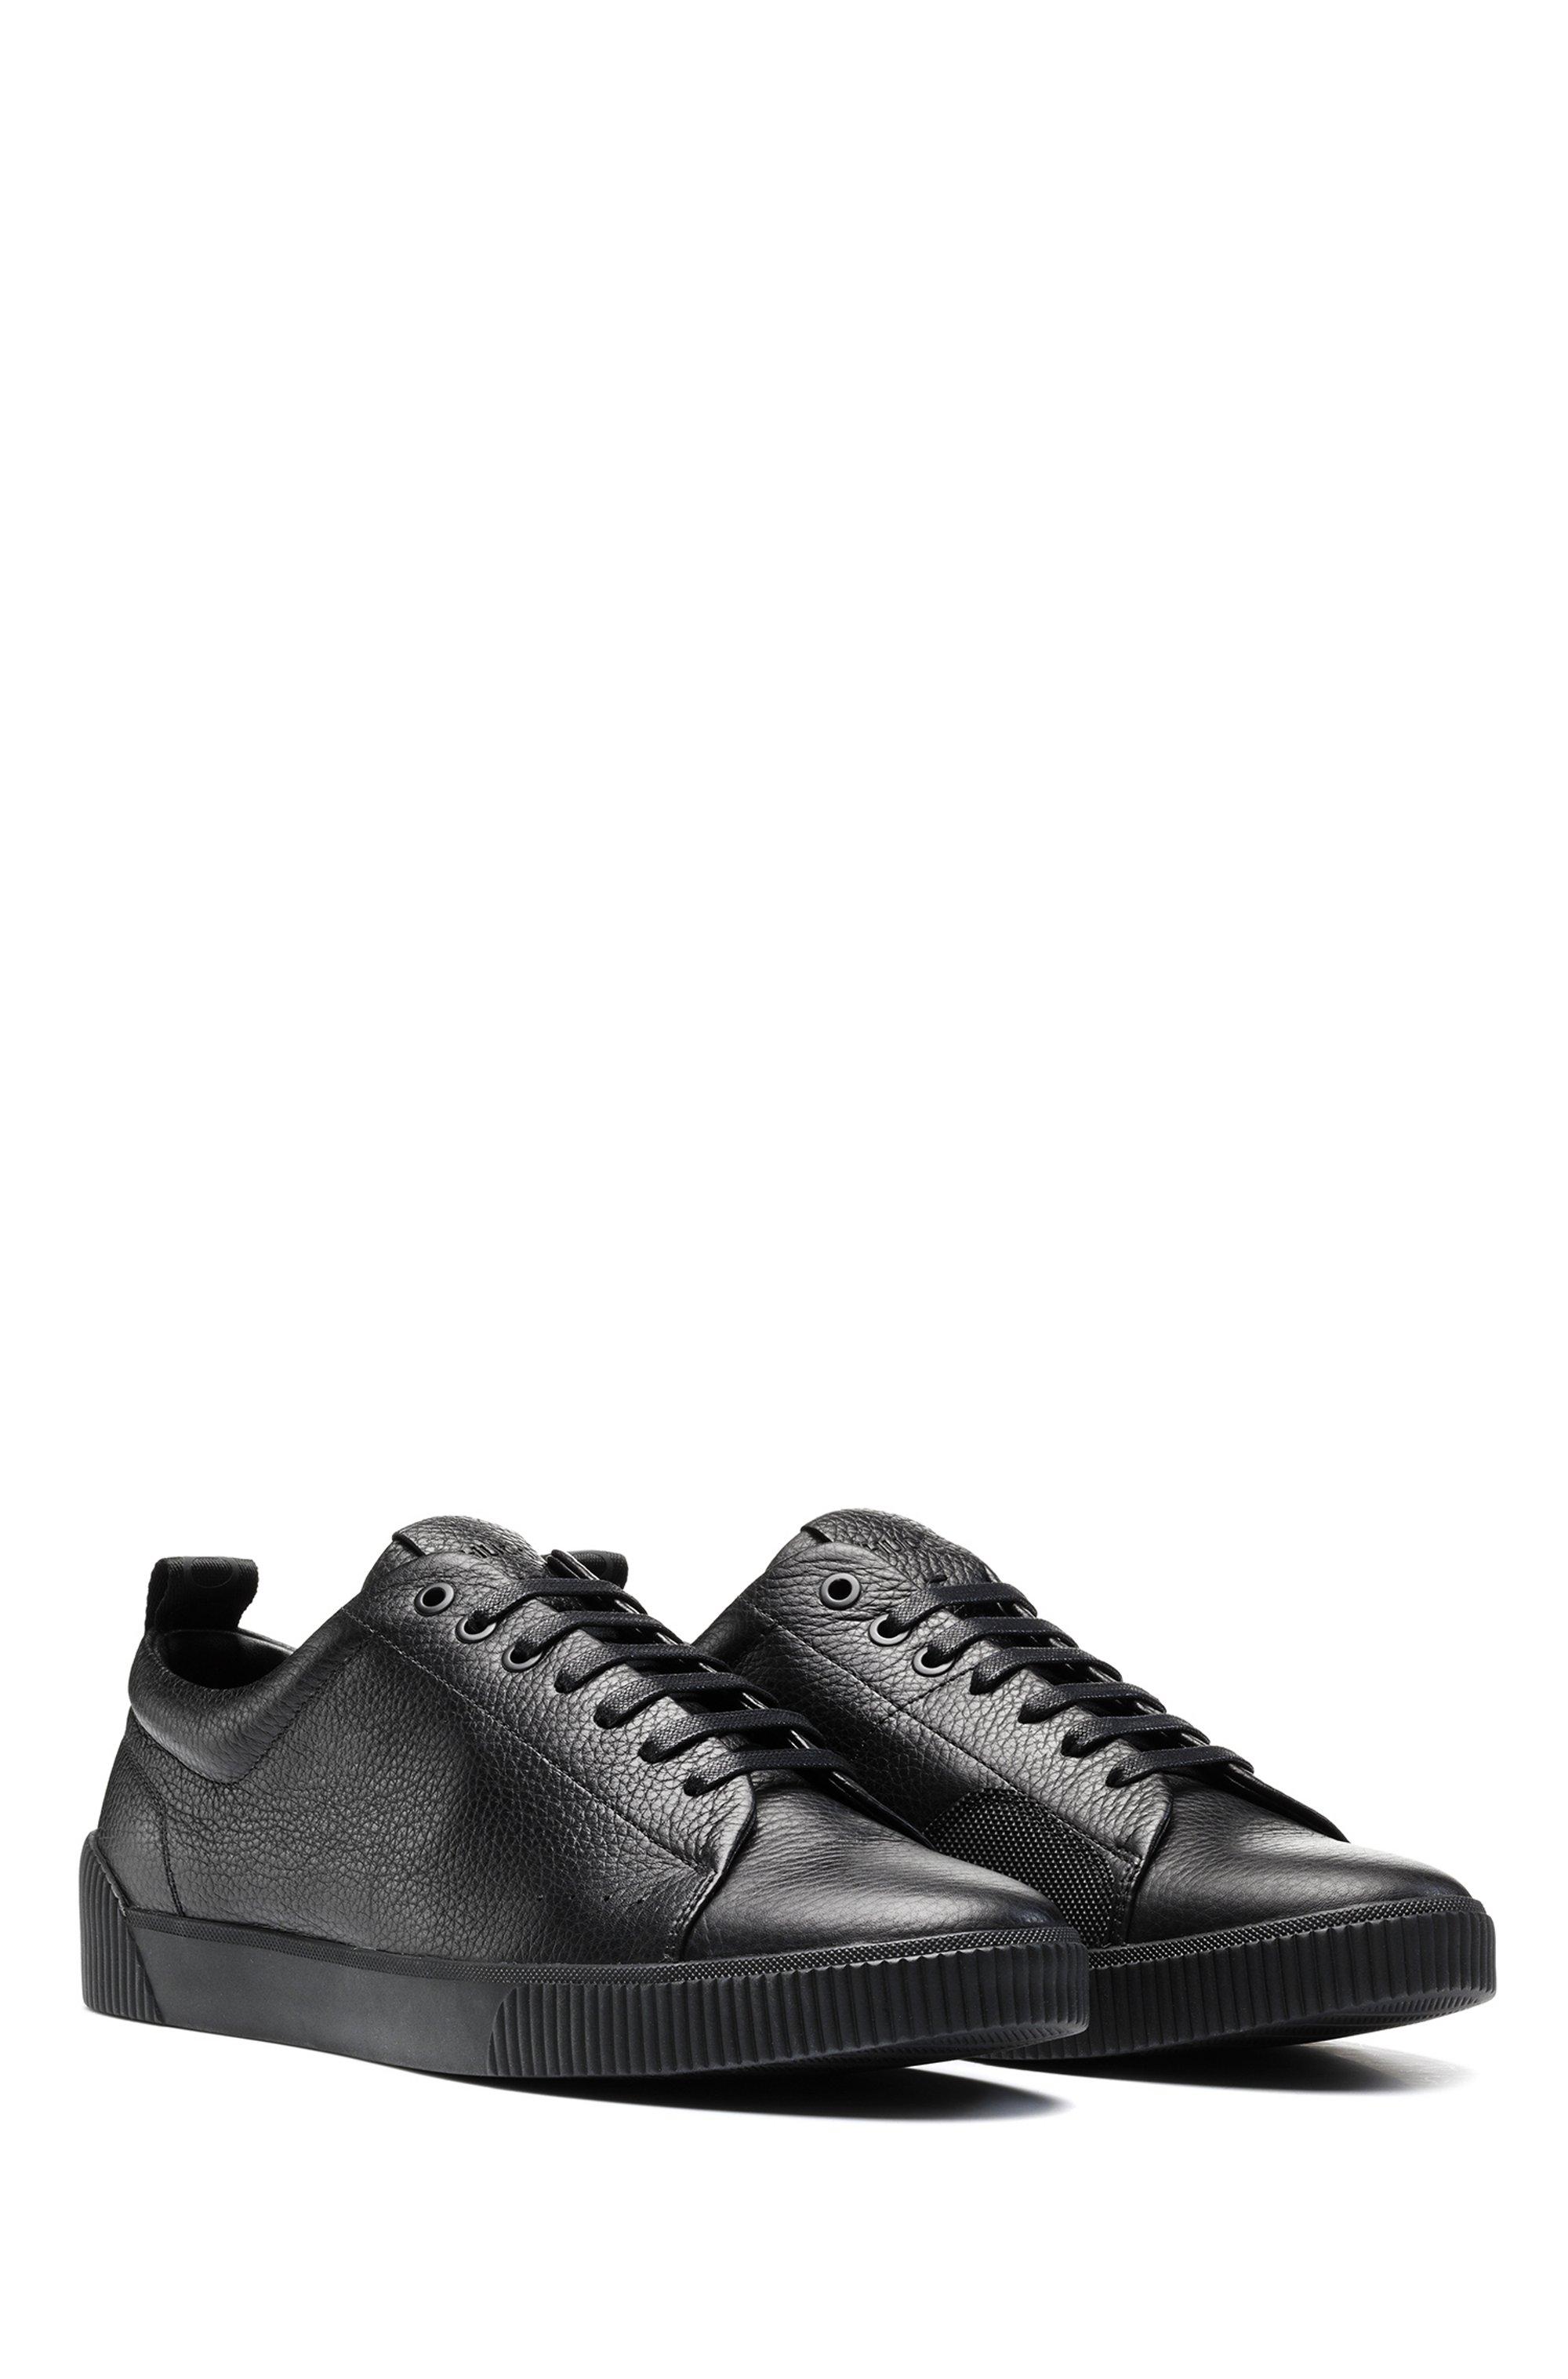 Sneakers aus genarbtem Leder im Tennis-Stil mit Logo-Tape aus Jacquard